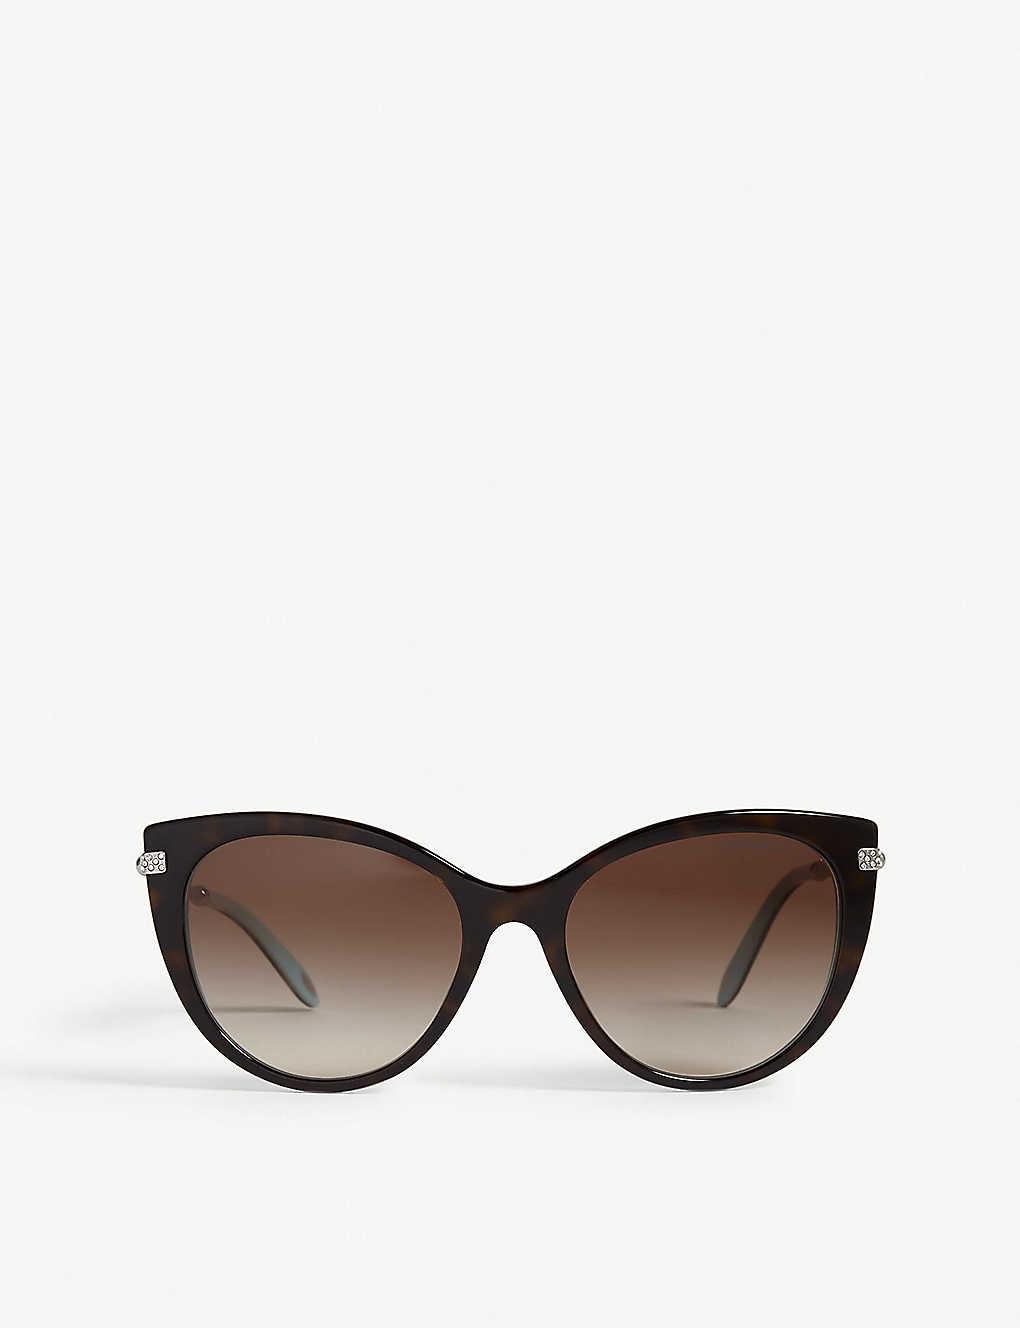 461778b8e05 TIFFANY   CO Tf4143b cat eye sunglasses